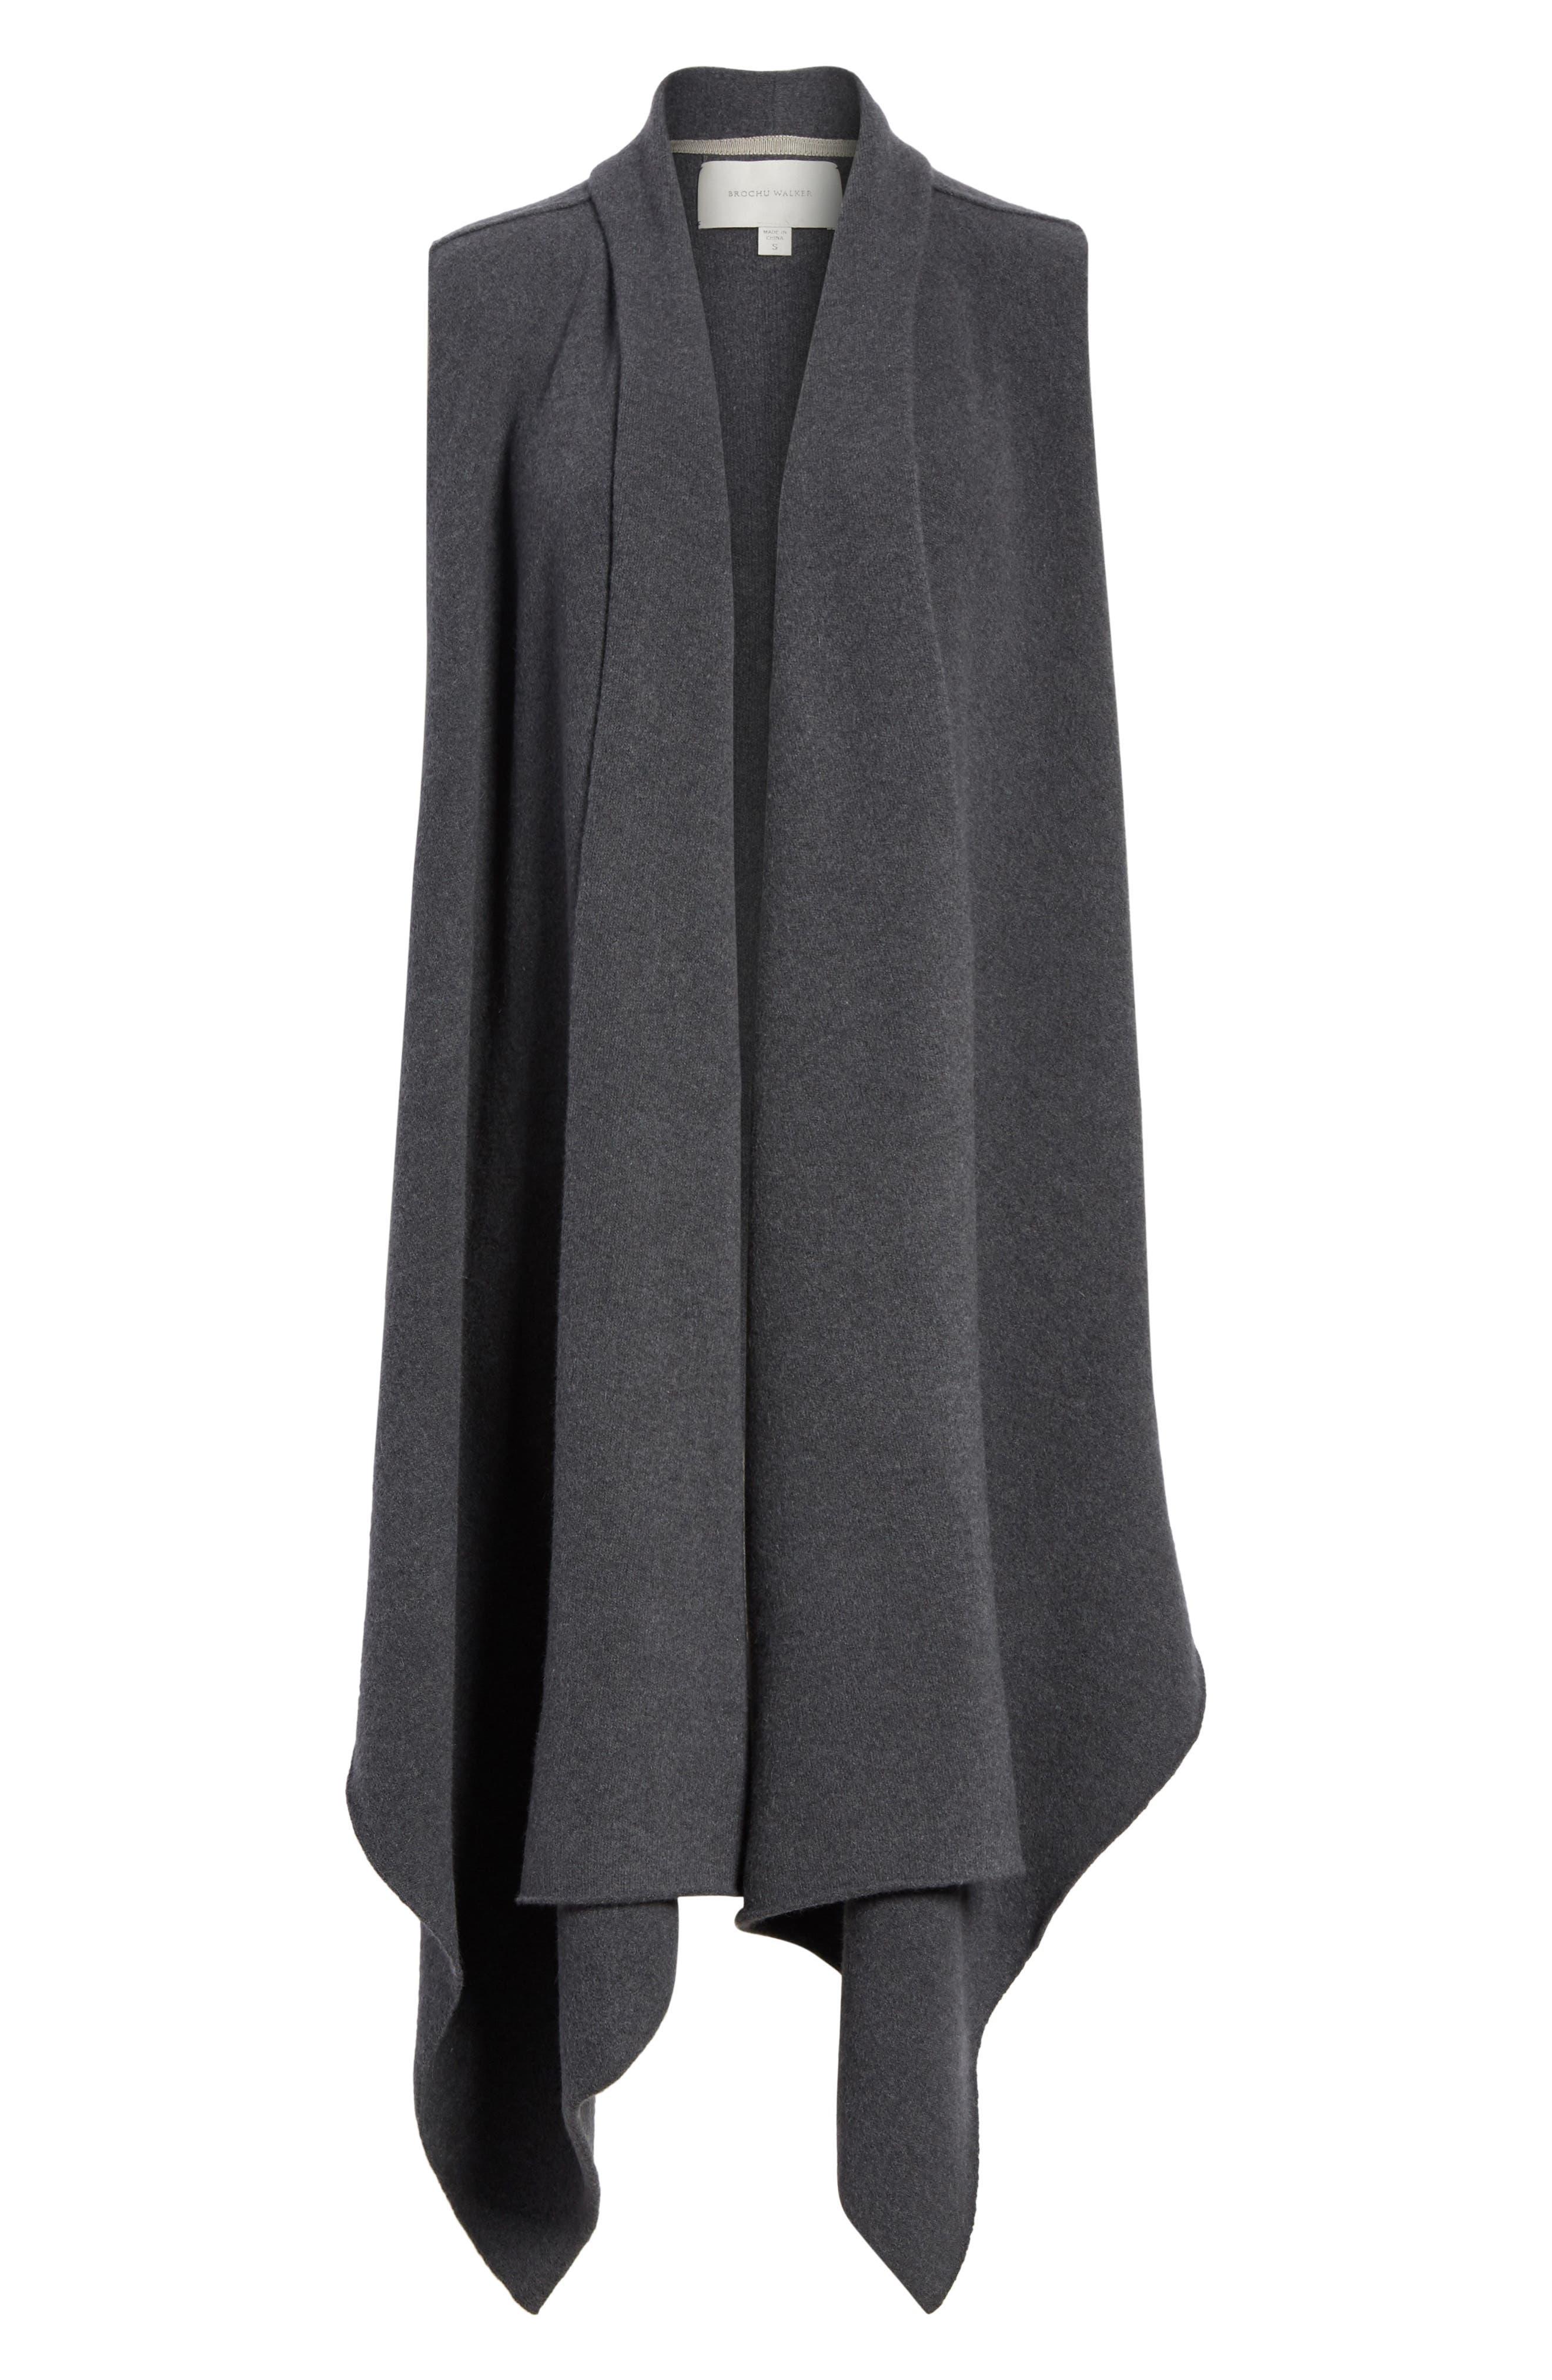 Sorin Merino Wool Blend Wrap Vest,                             Alternate thumbnail 6, color,                             Shale Melange